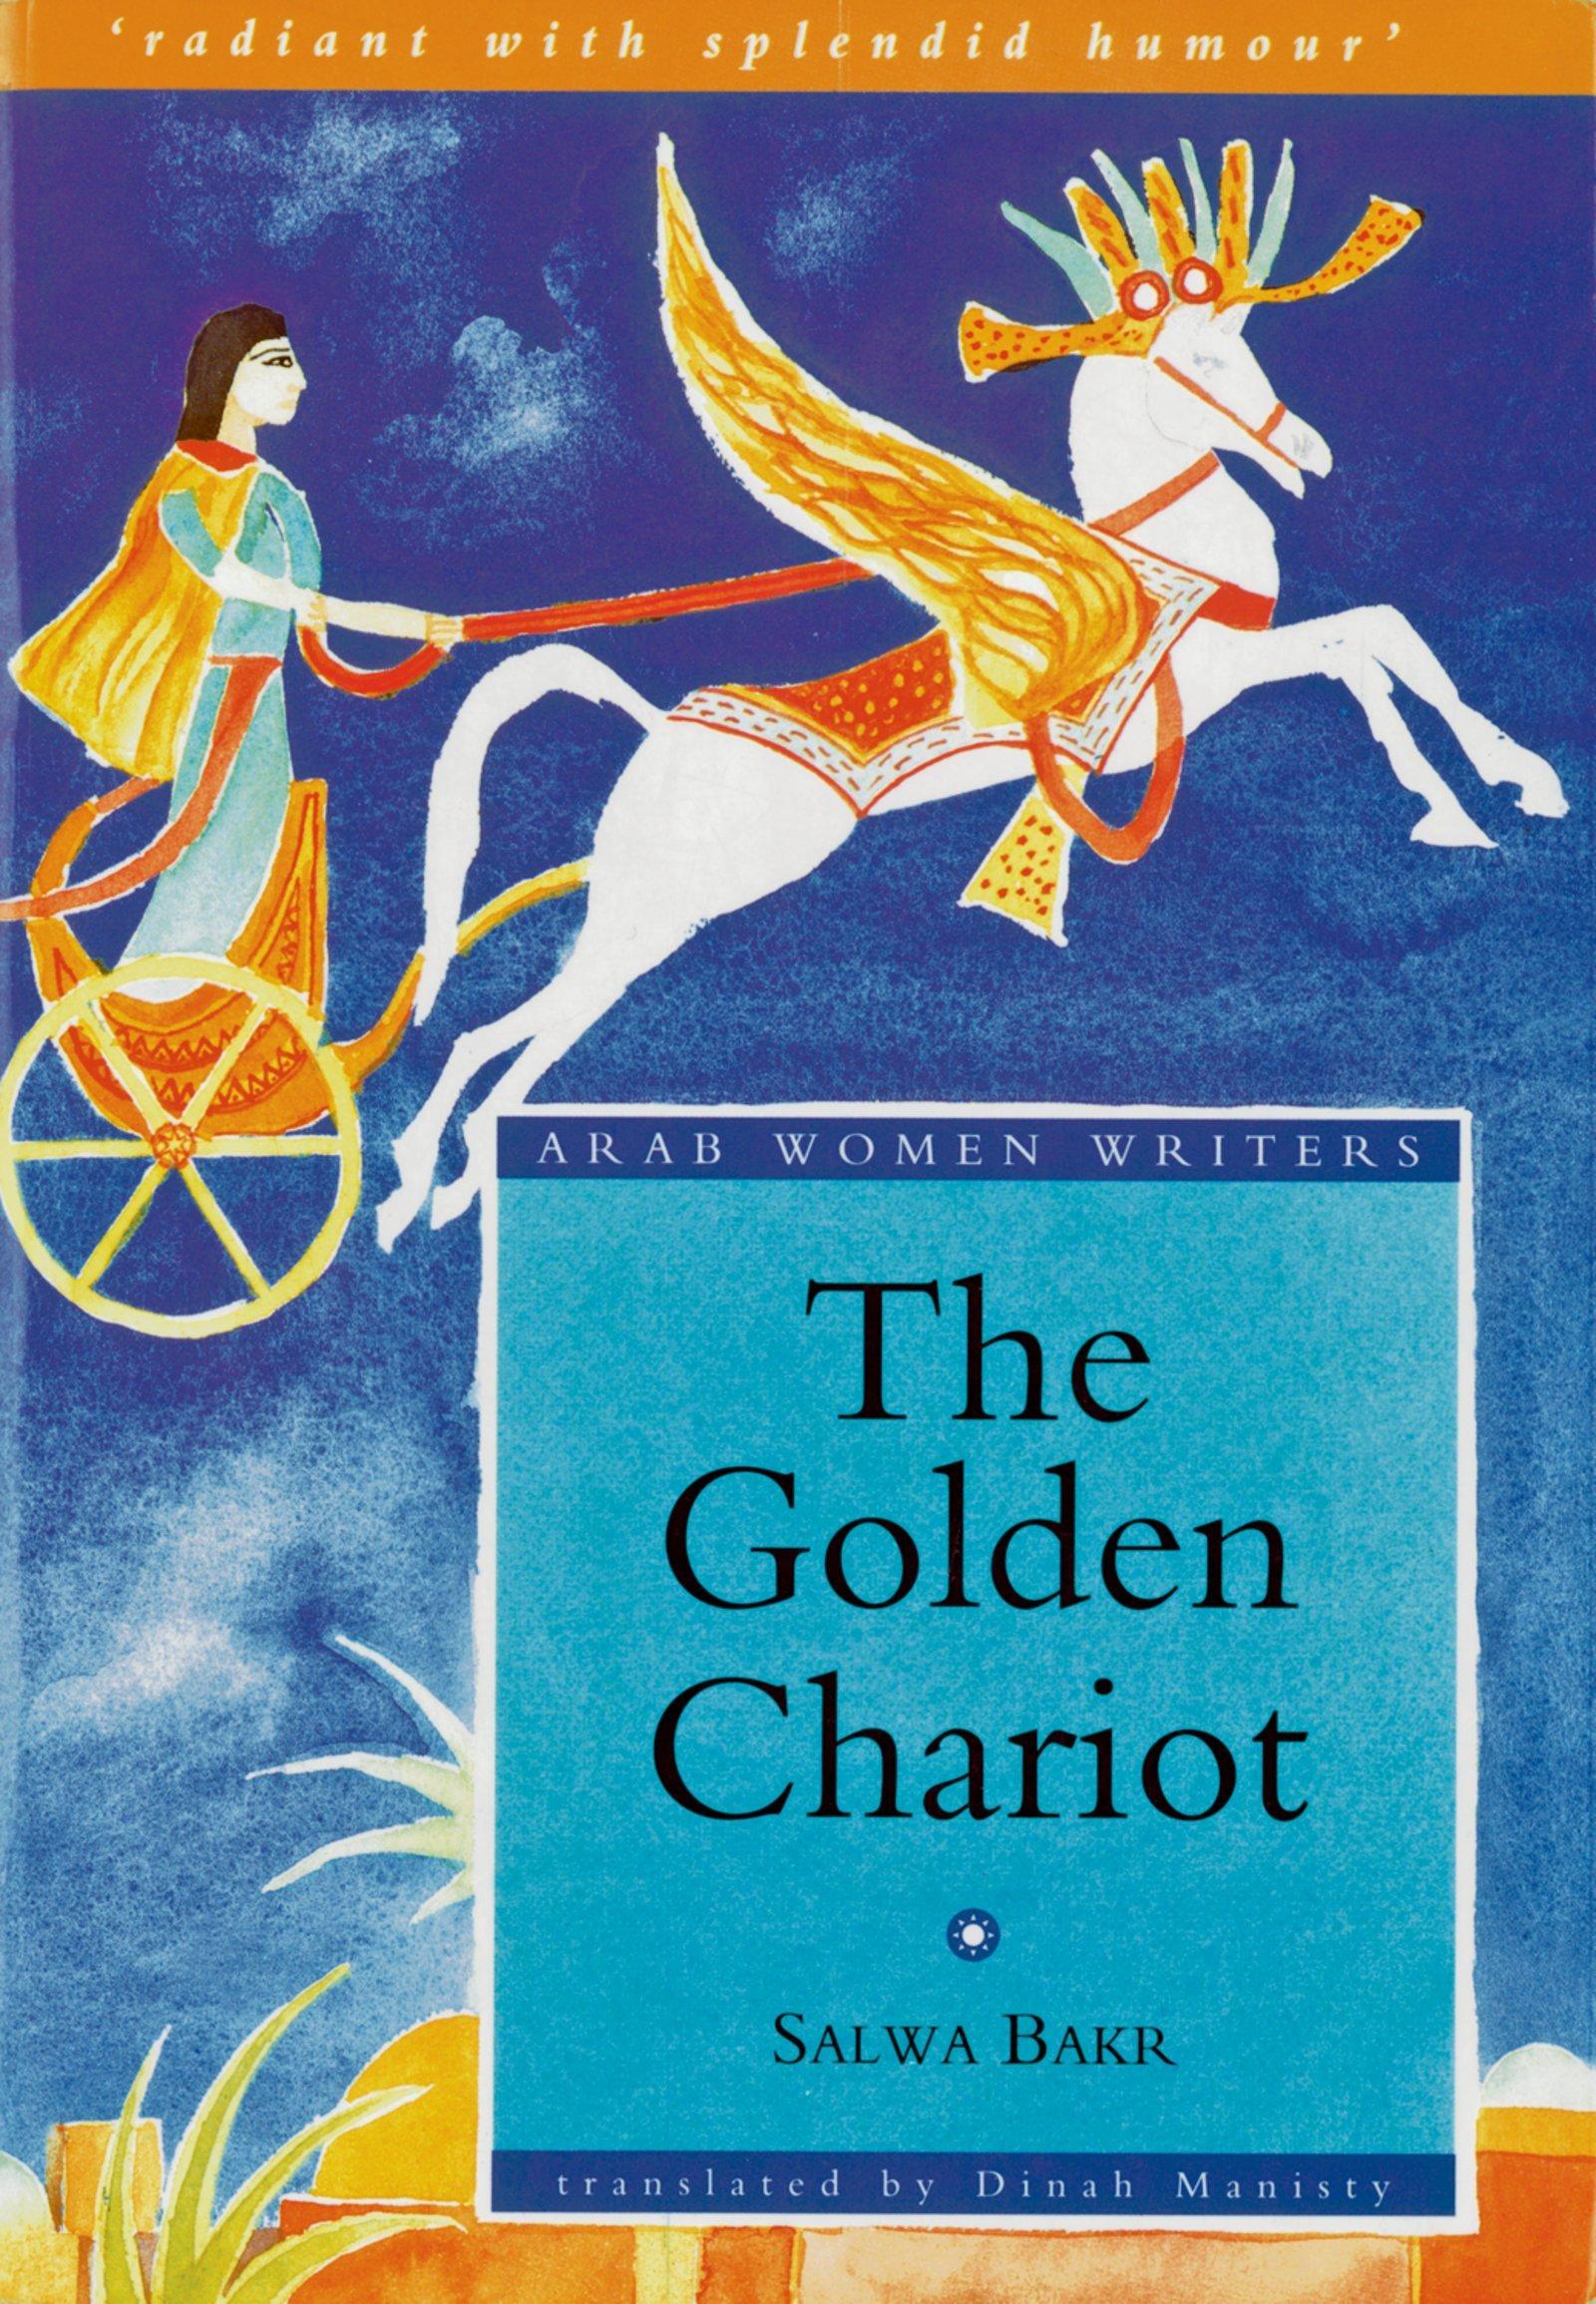 Download The Golden Chariot (Modern Arabic Literature (Paperback)) ebook